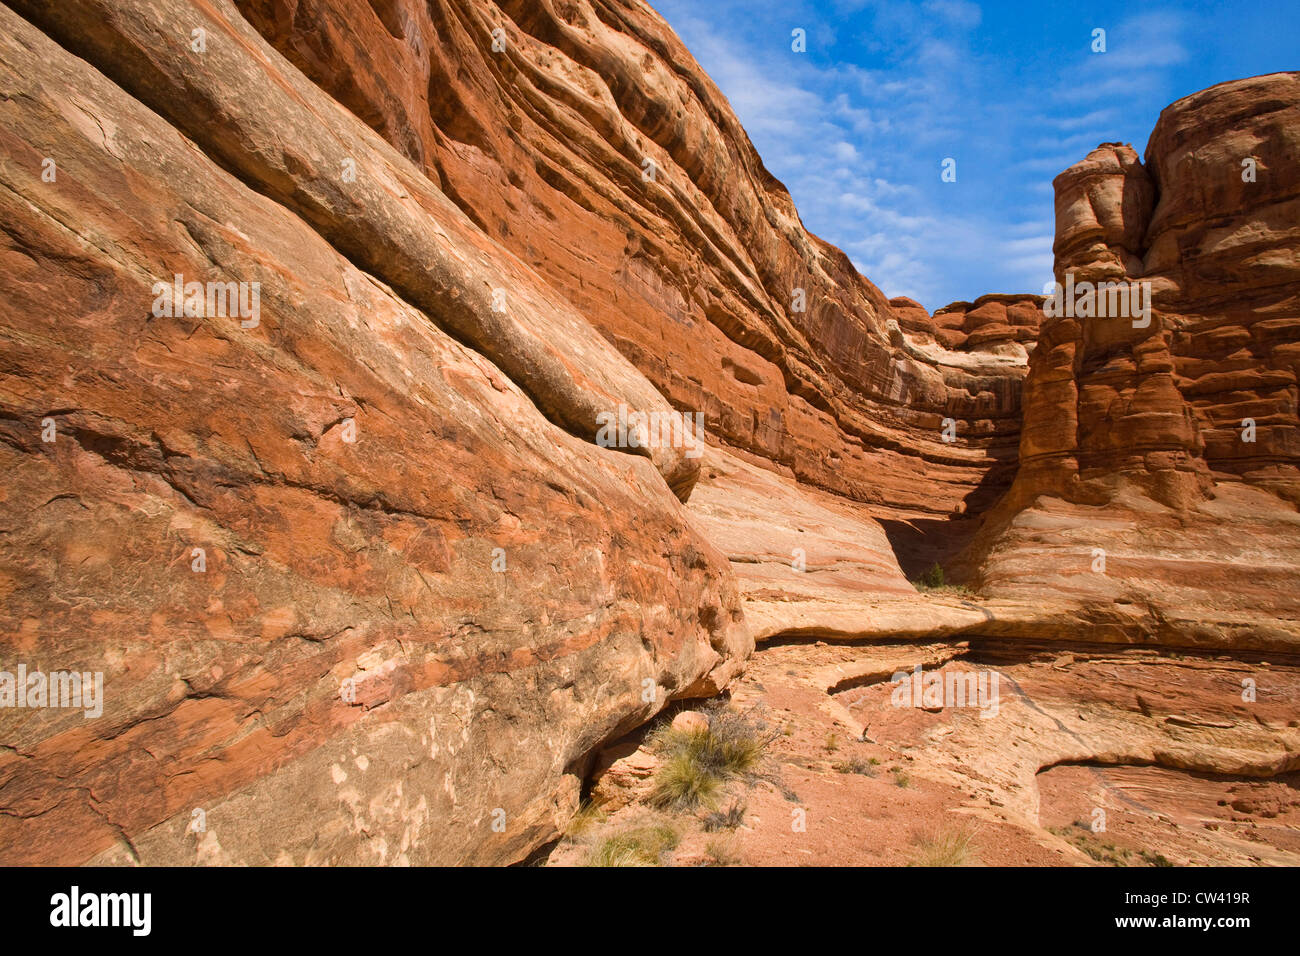 Rock formations on a landscape, Canyonlands National Park, Utah, USA - Stock Image